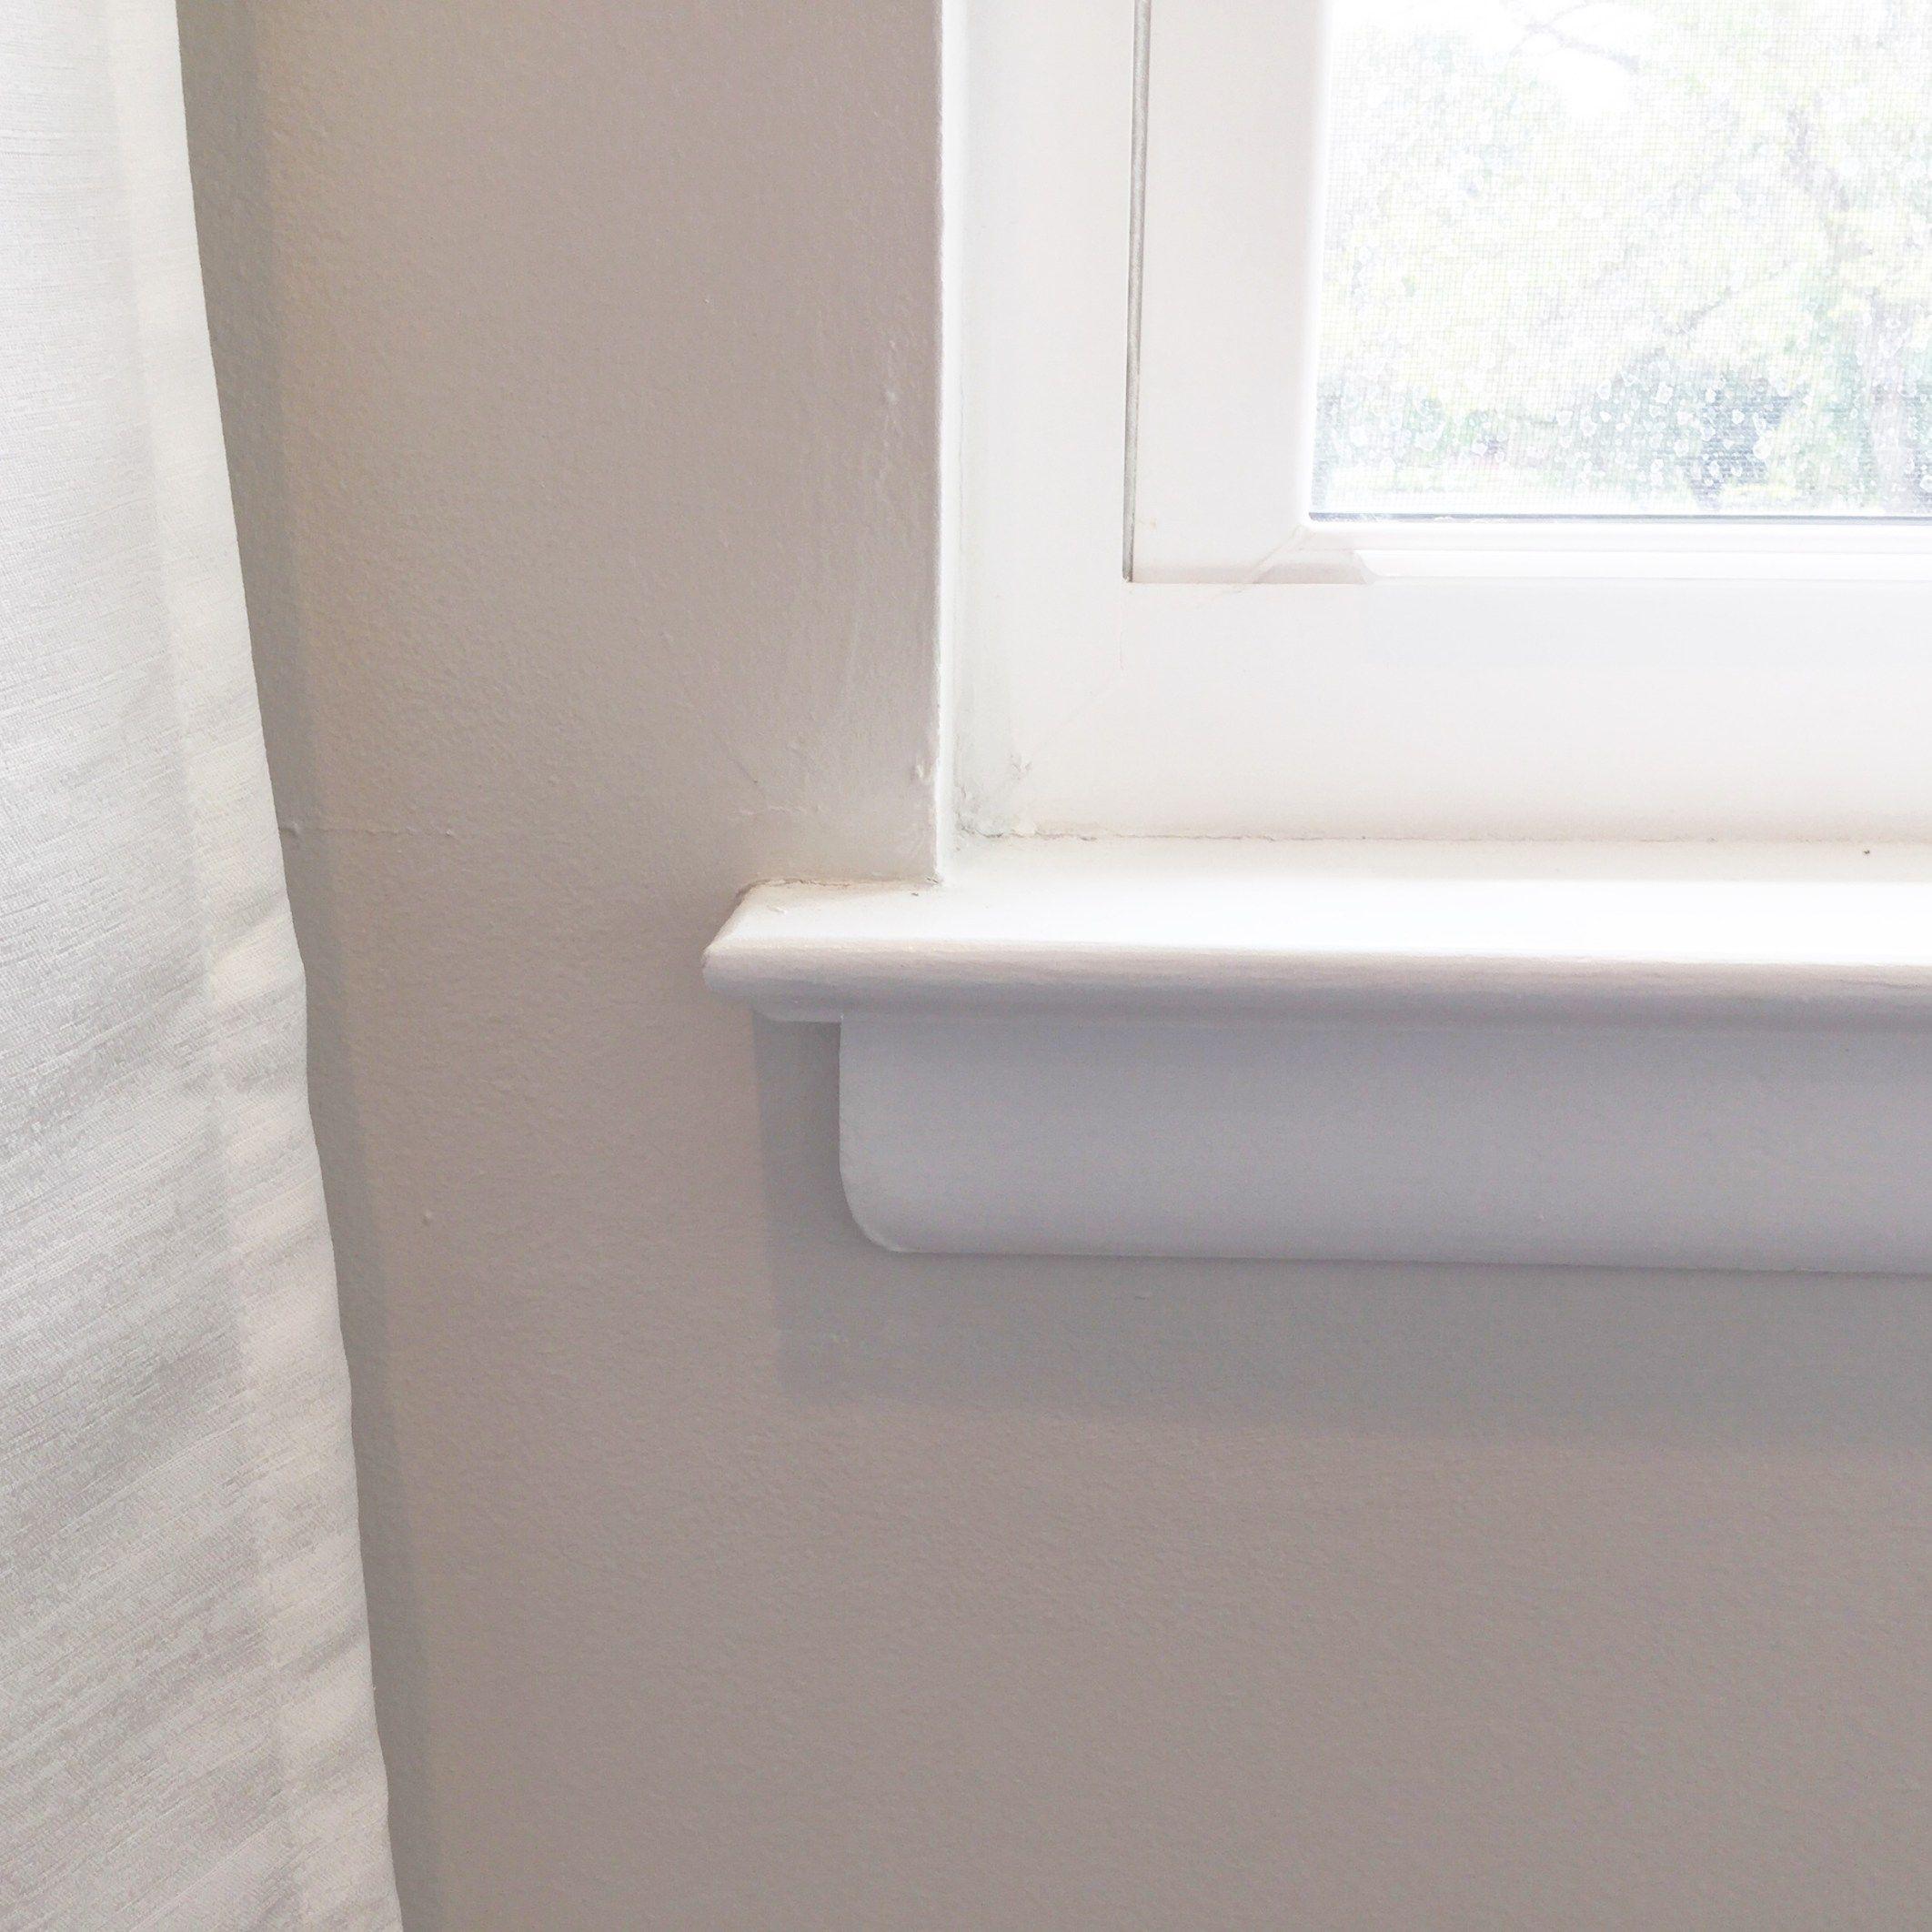 Diy Trim Molding To Existing Window Sill Diy Window Trim Moldings And Trim Interior Window Trim